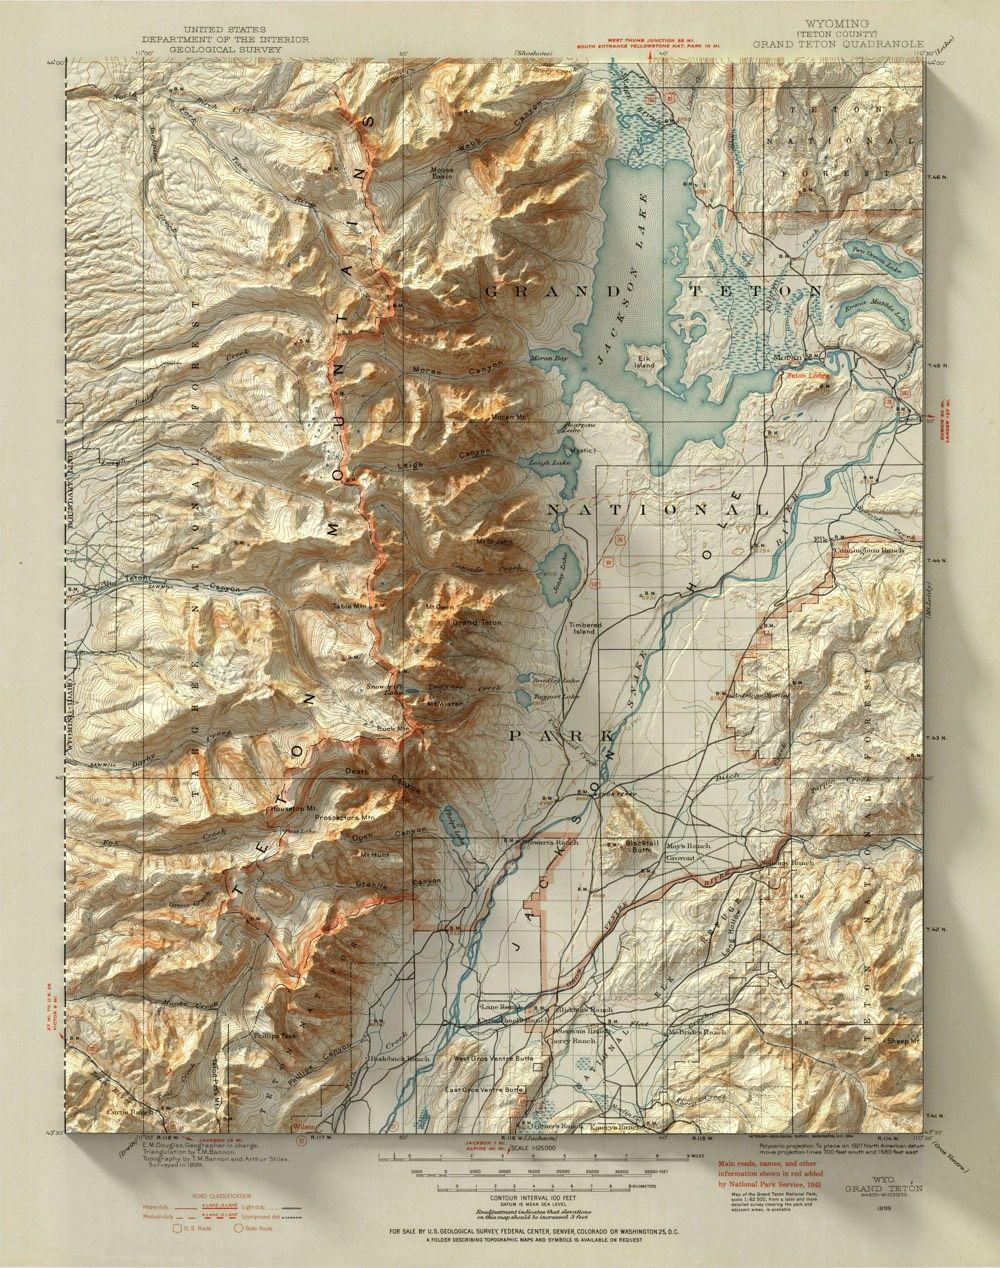 denver colorado elevation map Historic Topographic Maps Pushed Into 3d Map Artwork Vintage Maps Topographic Map denver colorado elevation map